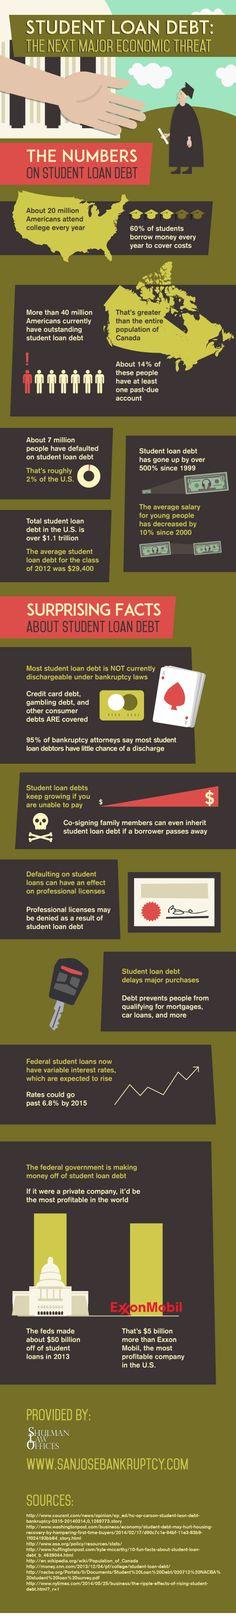 Should I take a risk to take a student loan?